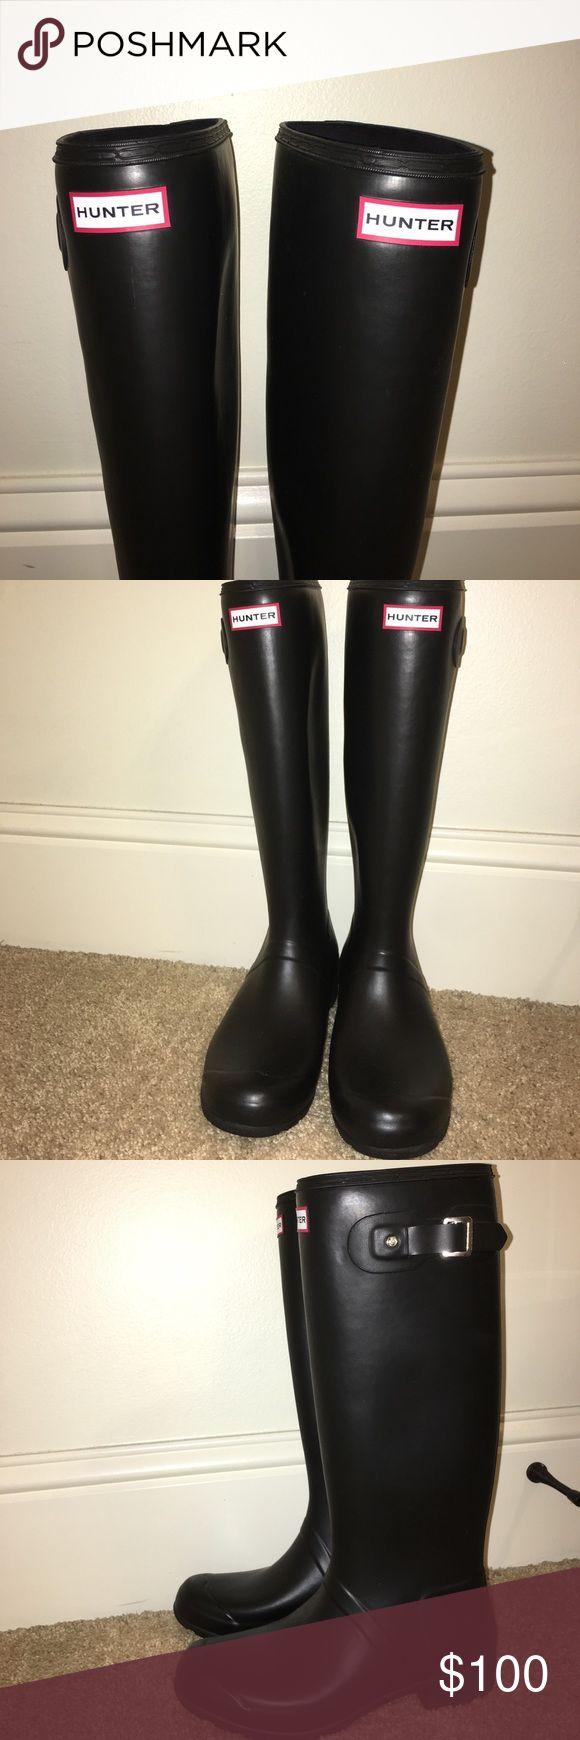 HUNTER black rain boots Brand new never worn authentic hunter rain boots Hunter Boots Shoes Winter & Rain Boots